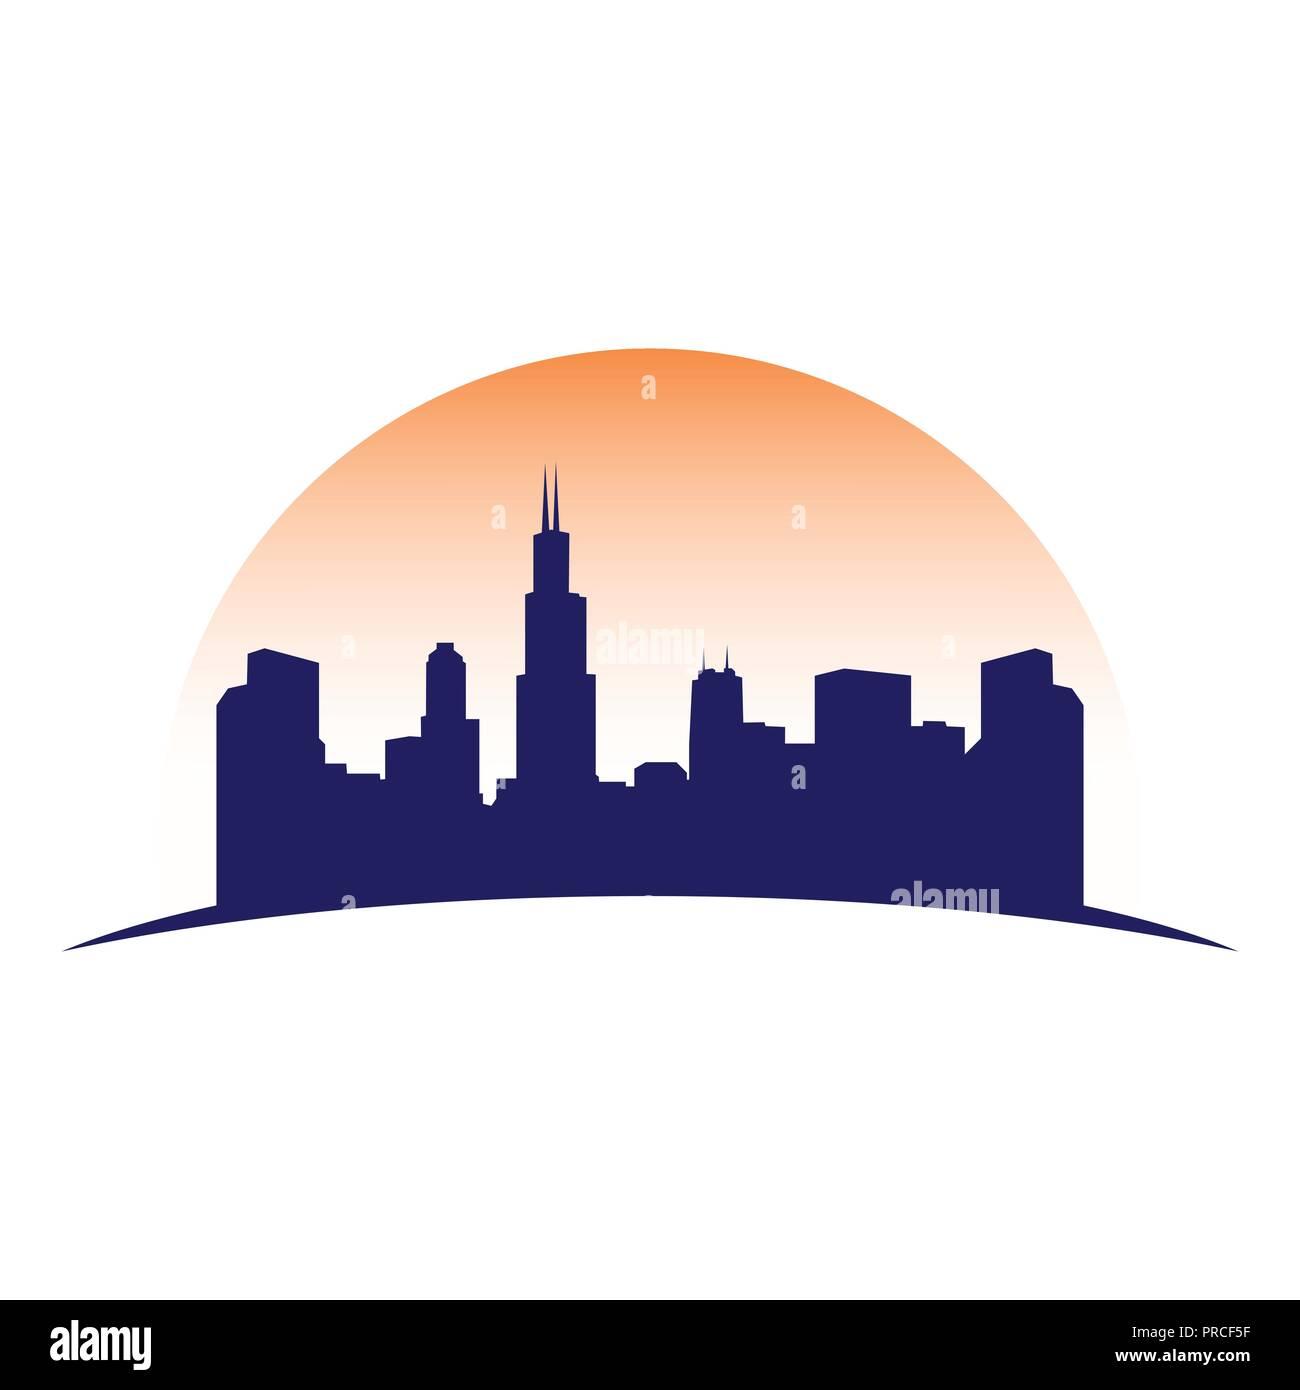 Urban City Skyline Silhouette Vector Symbol Graphic Logo Design Template - Stock Vector